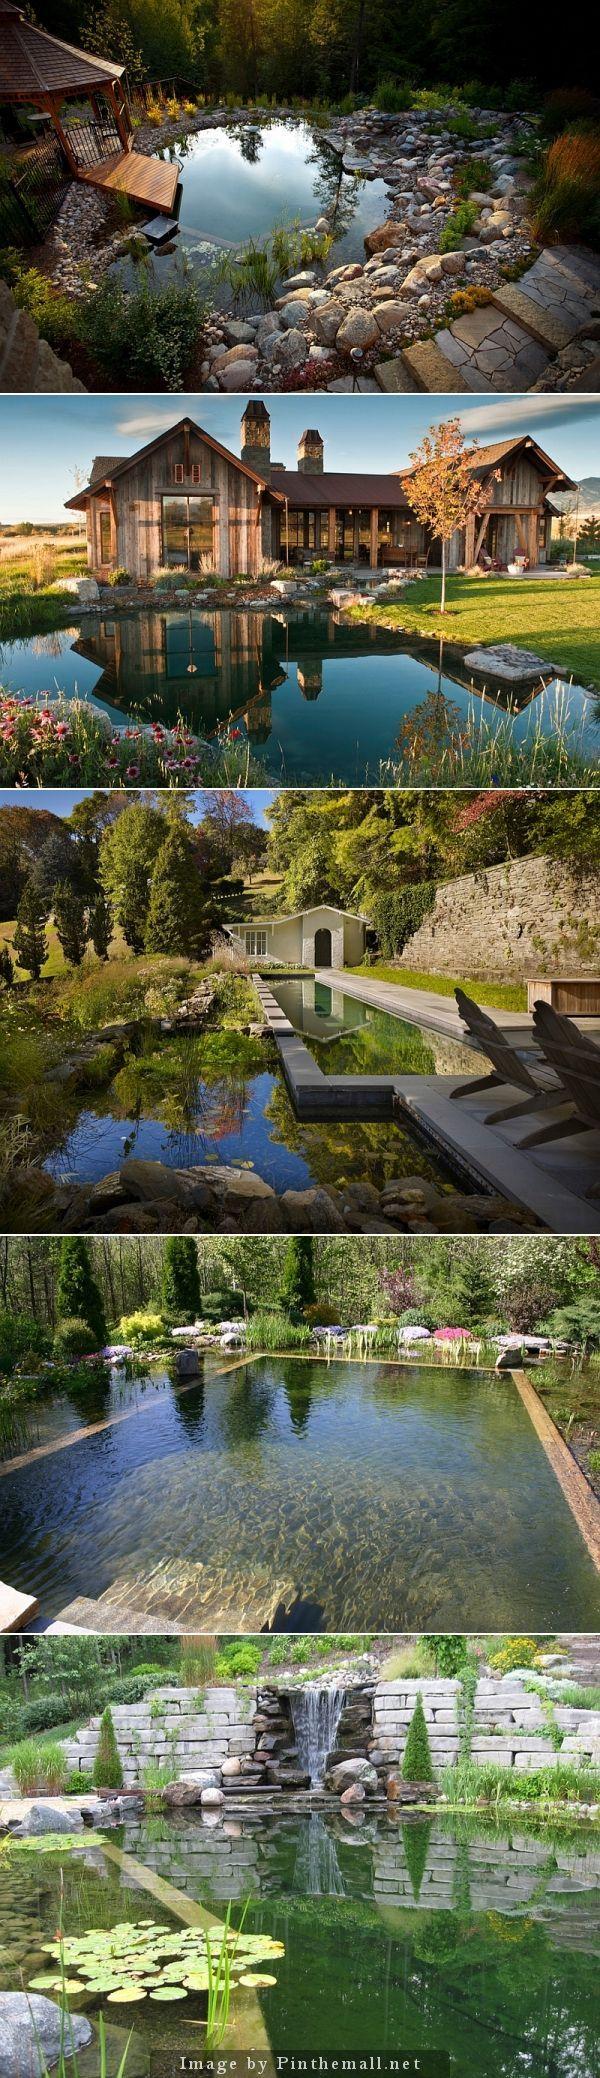 natural swimming pools design ideas inspirations photos